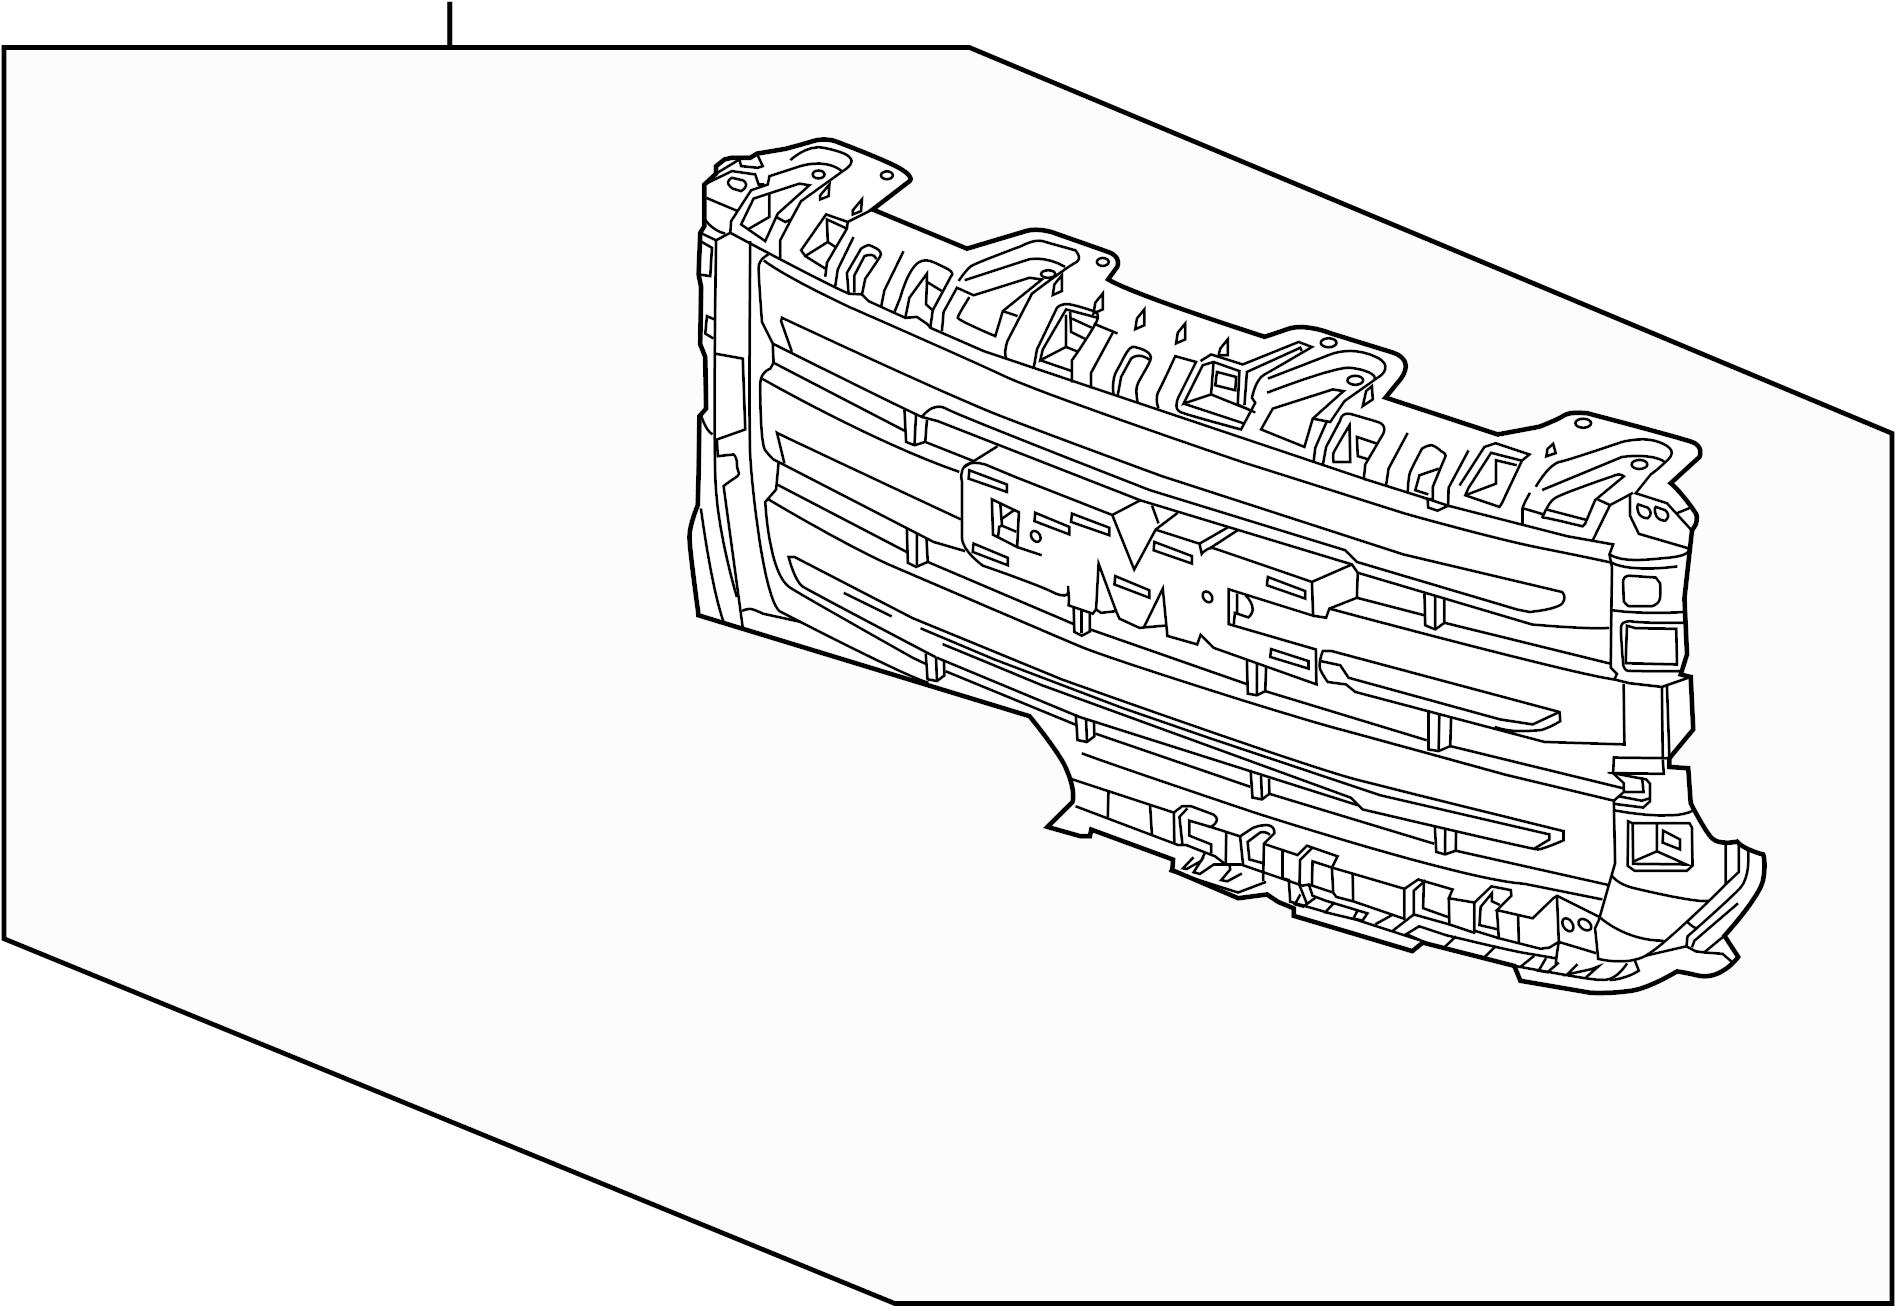 Gmc Sierra Grille Grille Ki Grille Kit 15